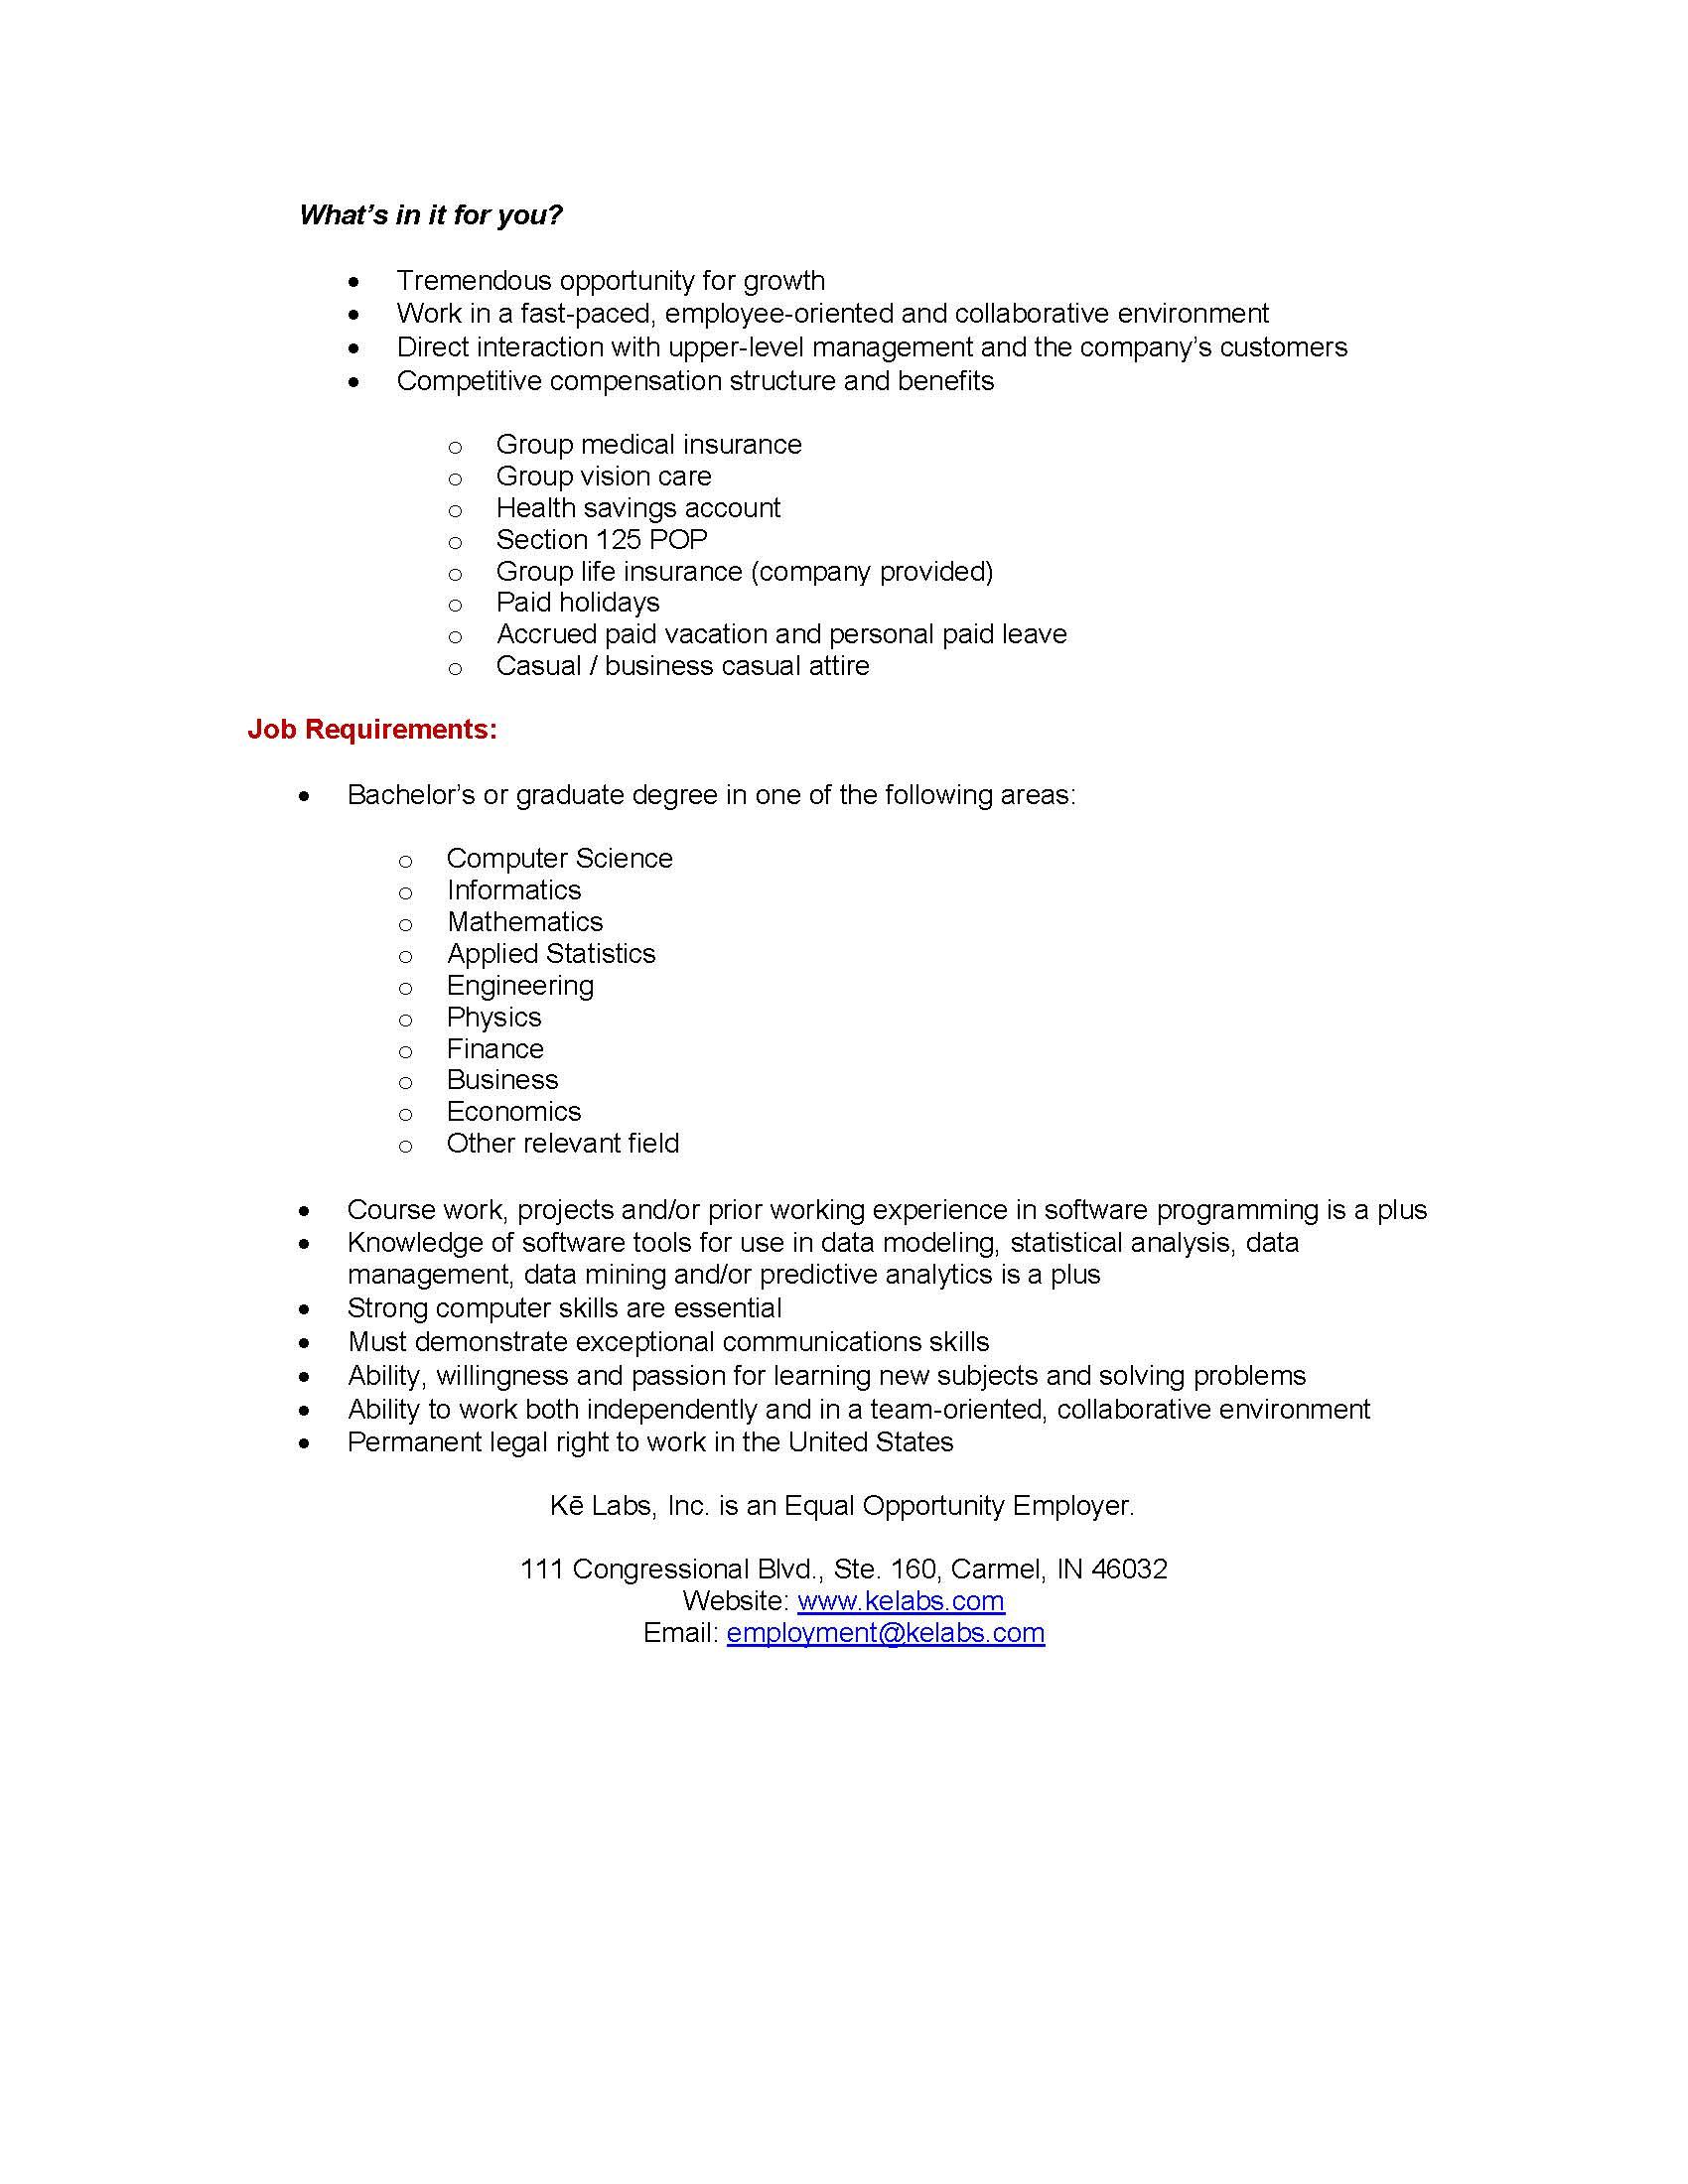 Ke Labs Inc (Job Description U2013 Knowledge Engineer) (IU Informatics Spr  _Page_2 | Department Of Economics At Indiana University Bloomington